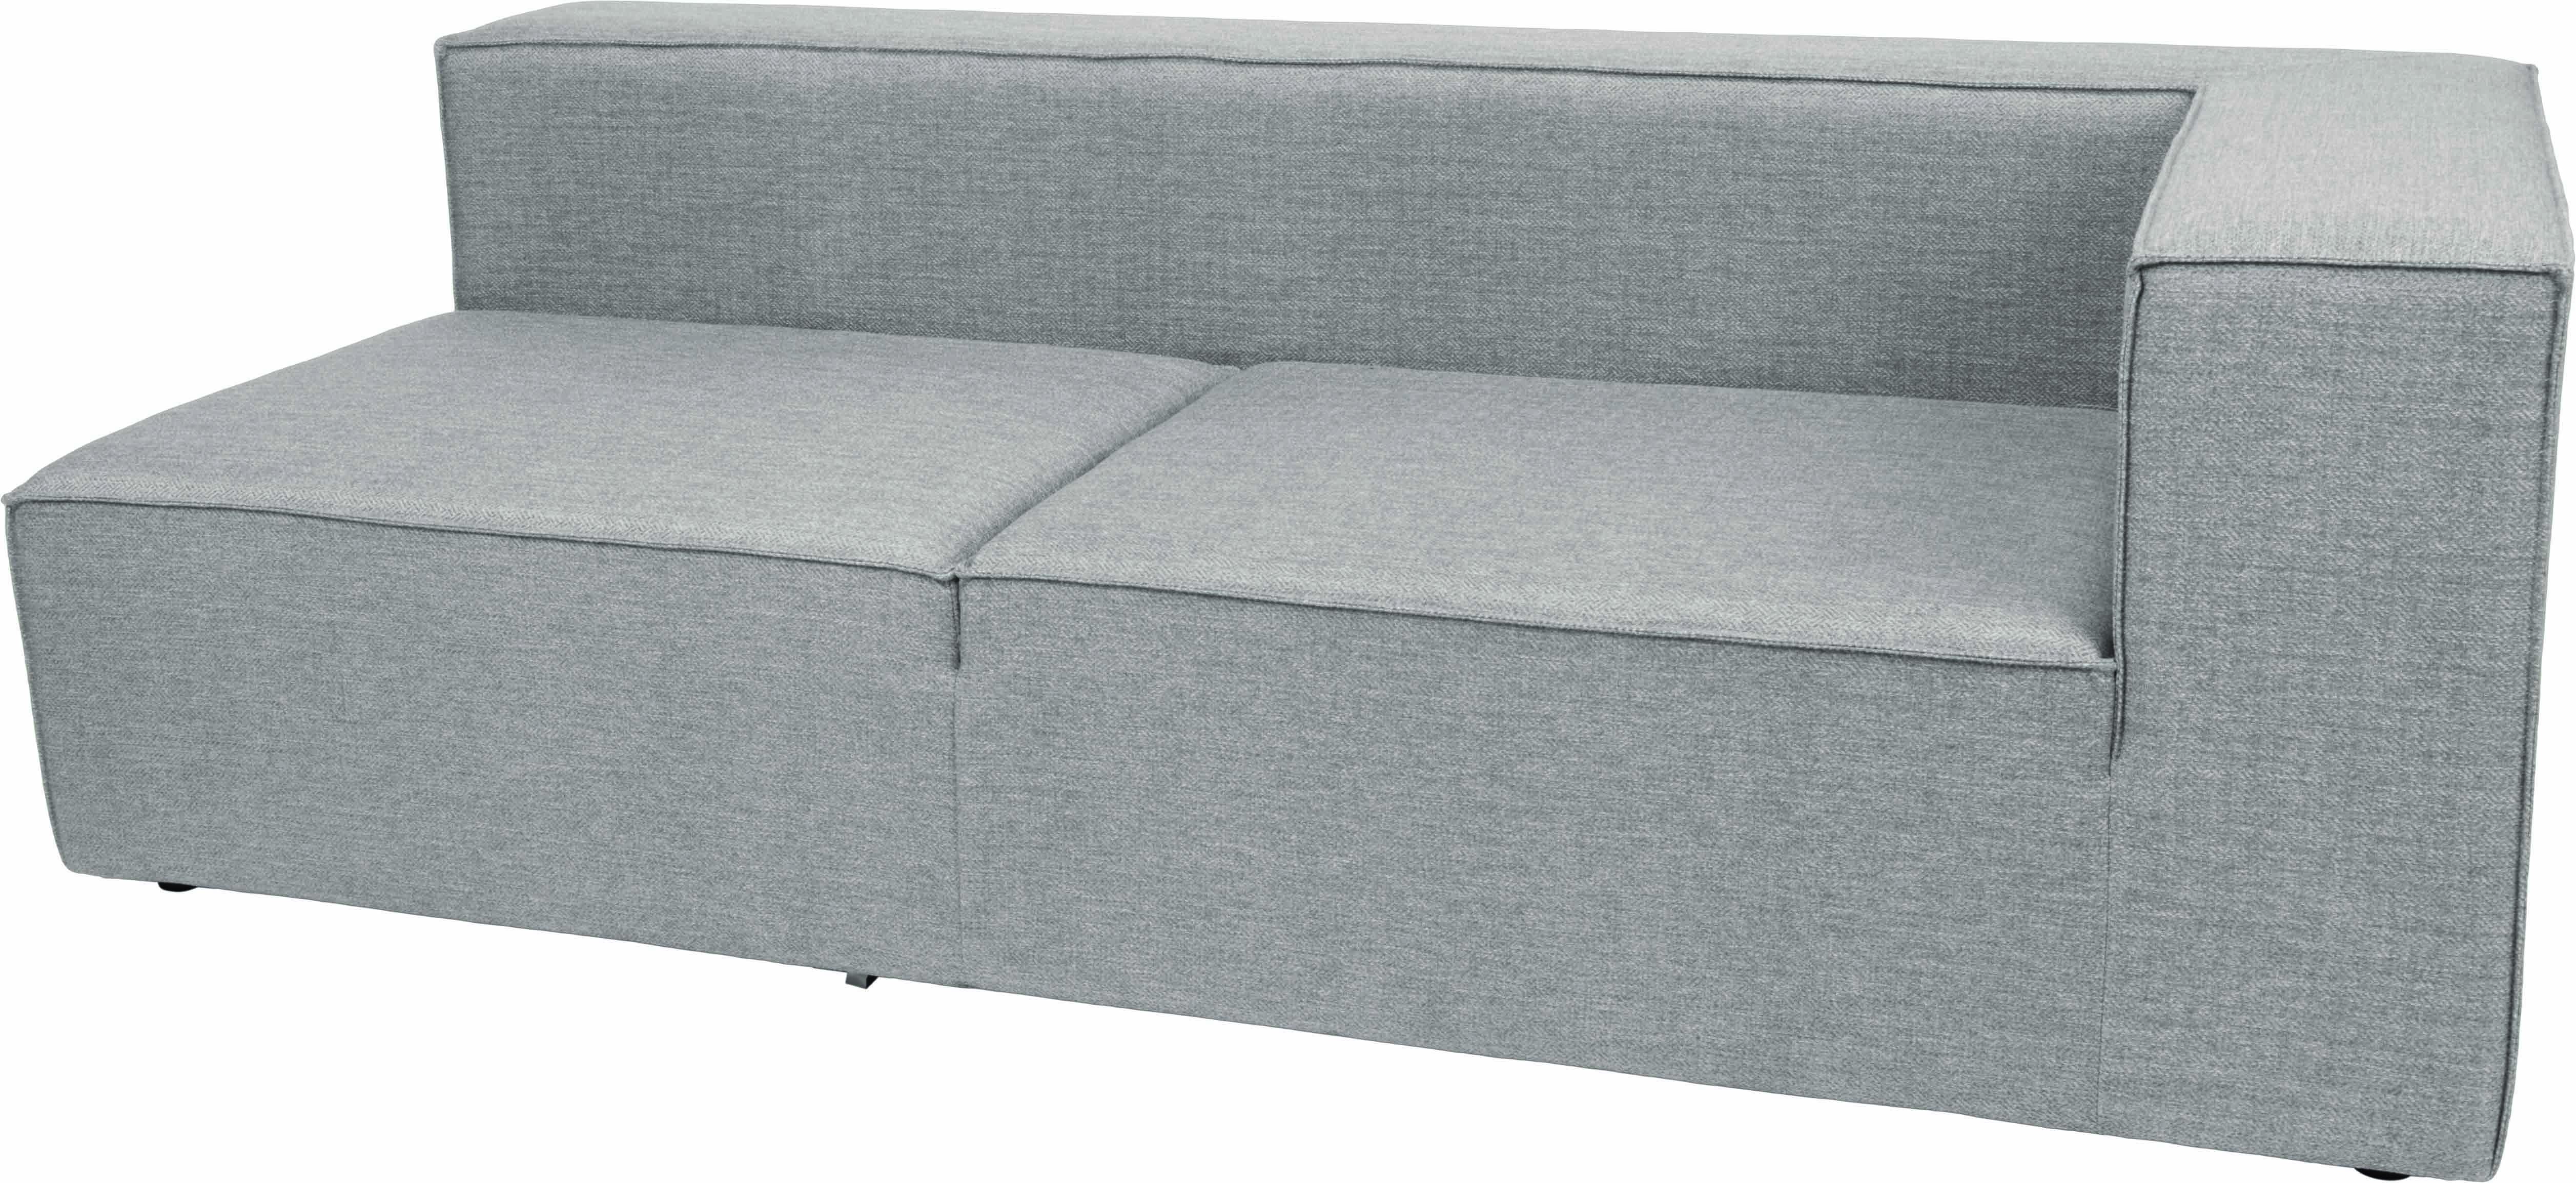 Charisma Sectional Sofa Luxury Sunbrella Outdoor Furniture Residential Contract Pool Patio Modular